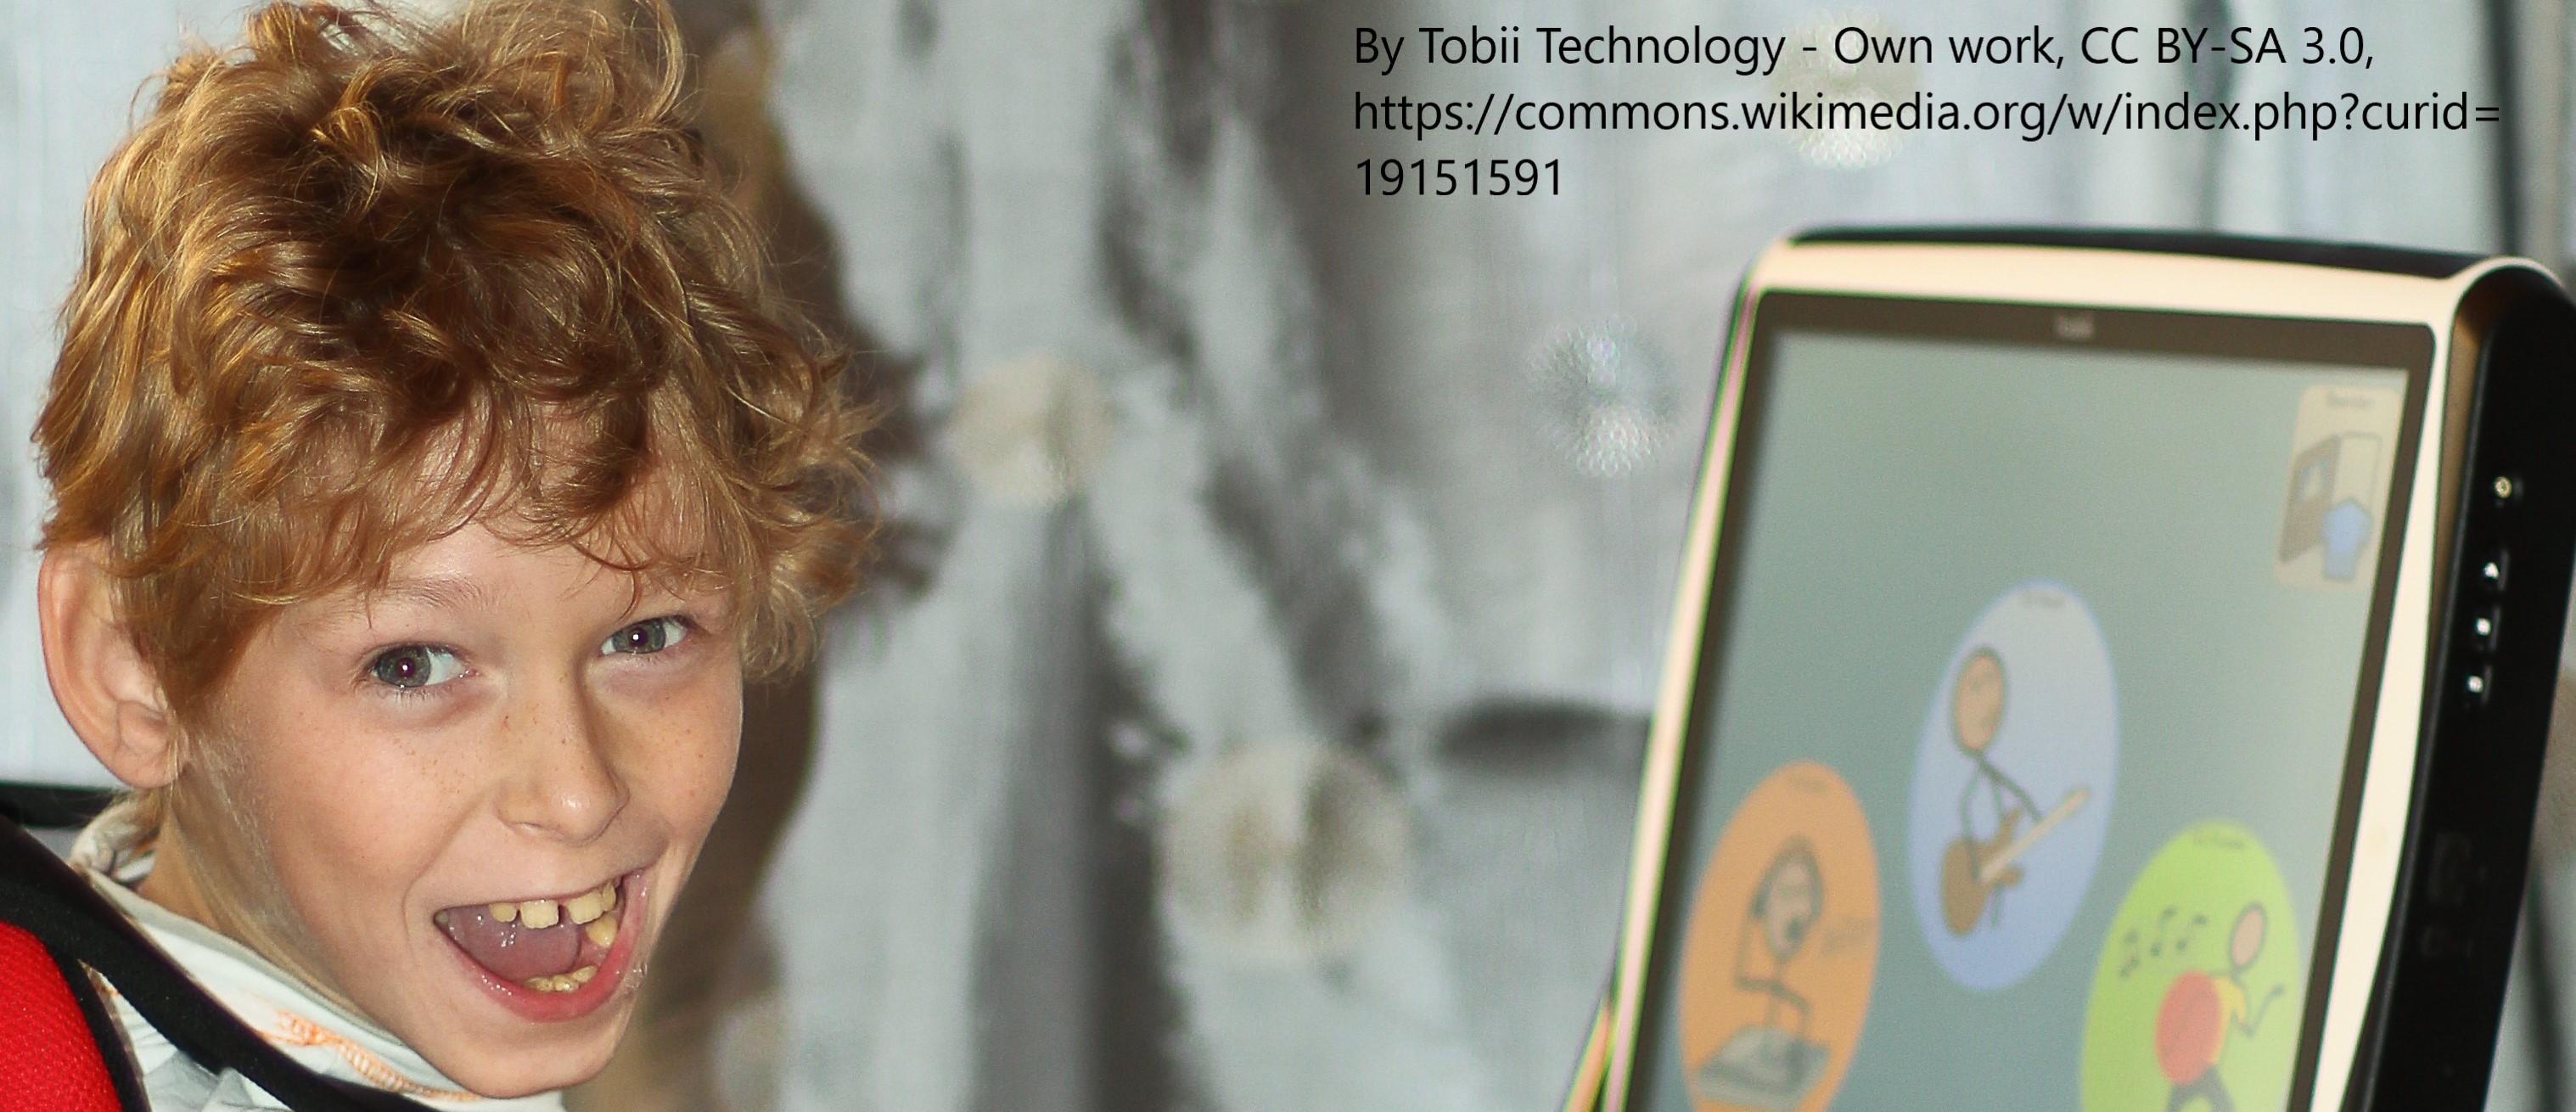 Ulrich using Tobii eye gaze